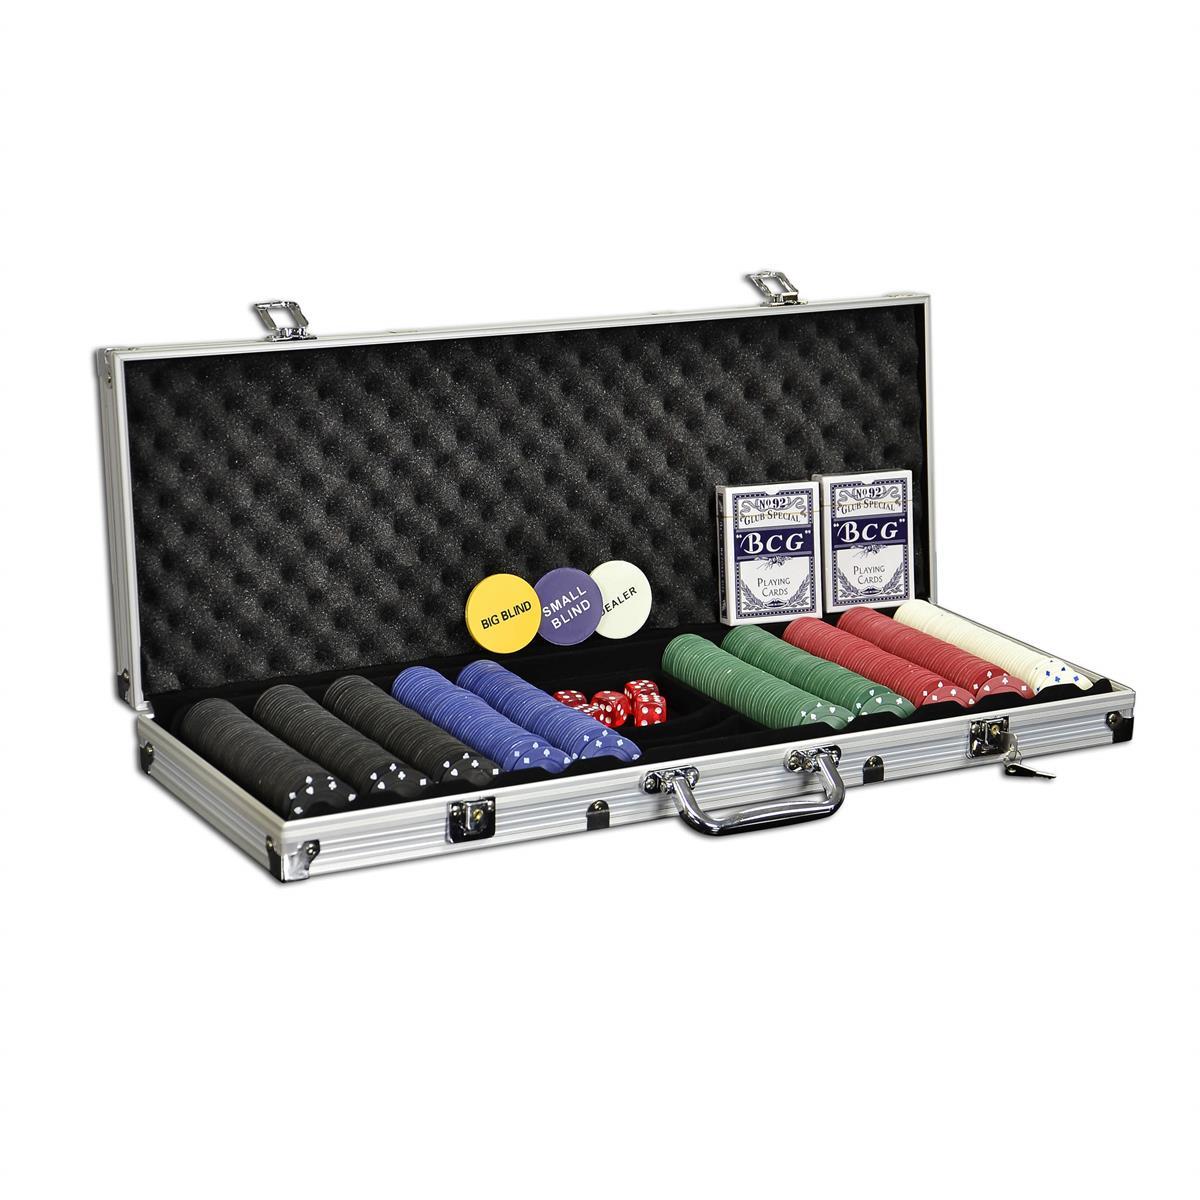 Pokerkoffer 500 Pokerchips Pokerset mit einfarbigen Standard Chips im Alukoffer